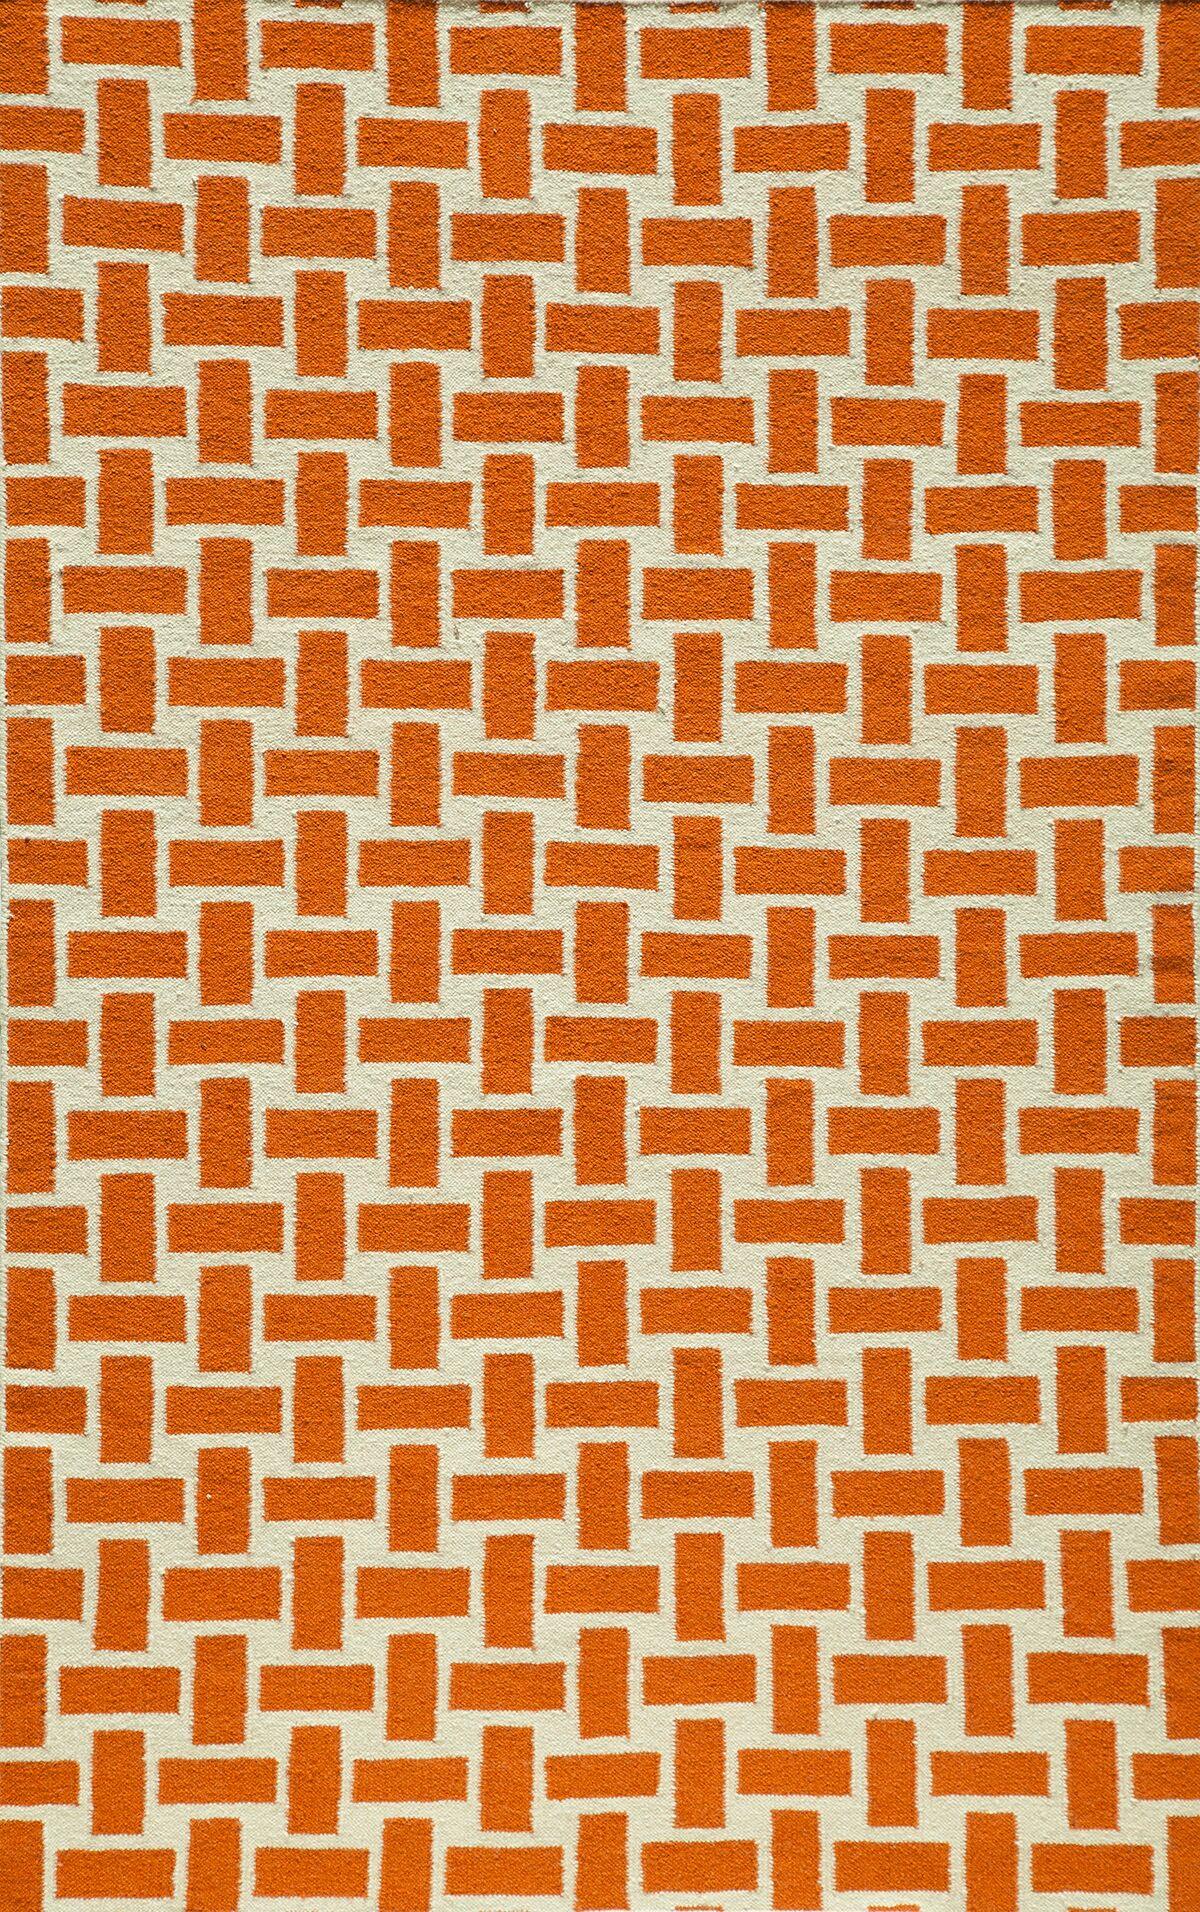 Hagler Hand-Woven Orange Area Rug Rug Size: Rectangle 8' x 10'